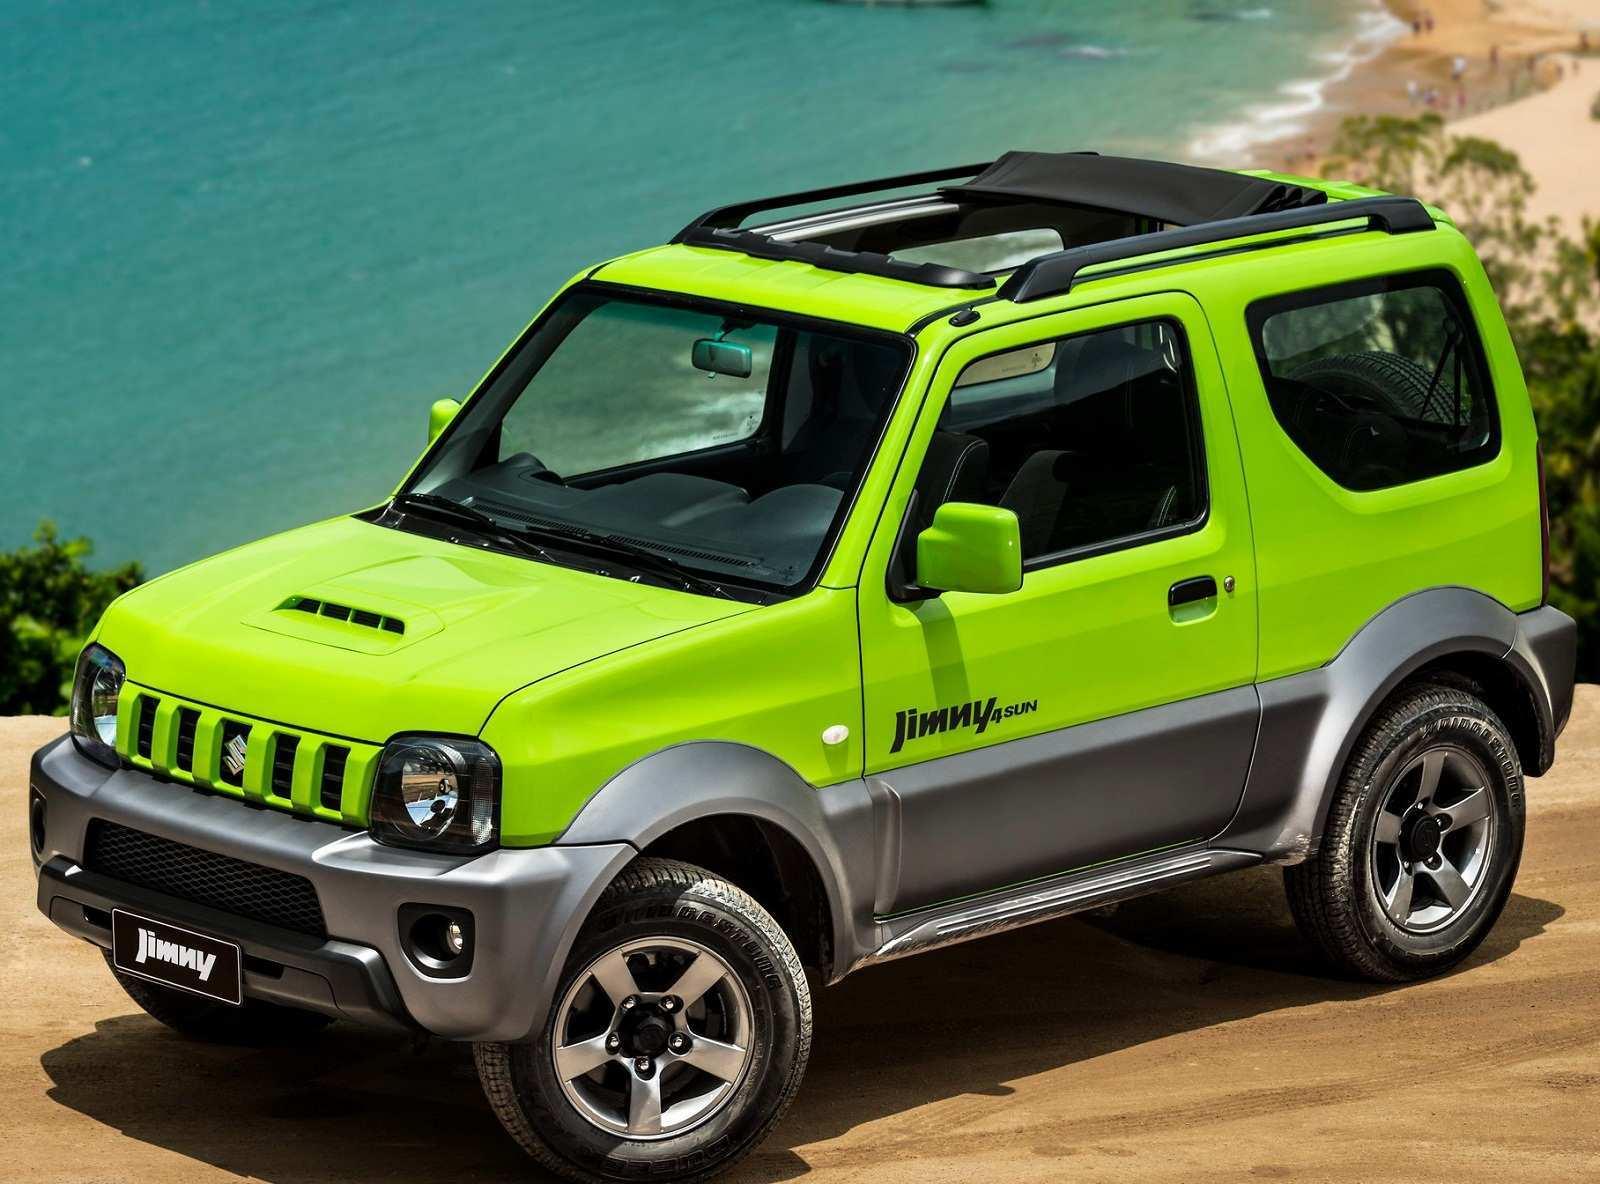 42 New 2020 Suzuki Jimny 2018 History by 2020 Suzuki Jimny 2018